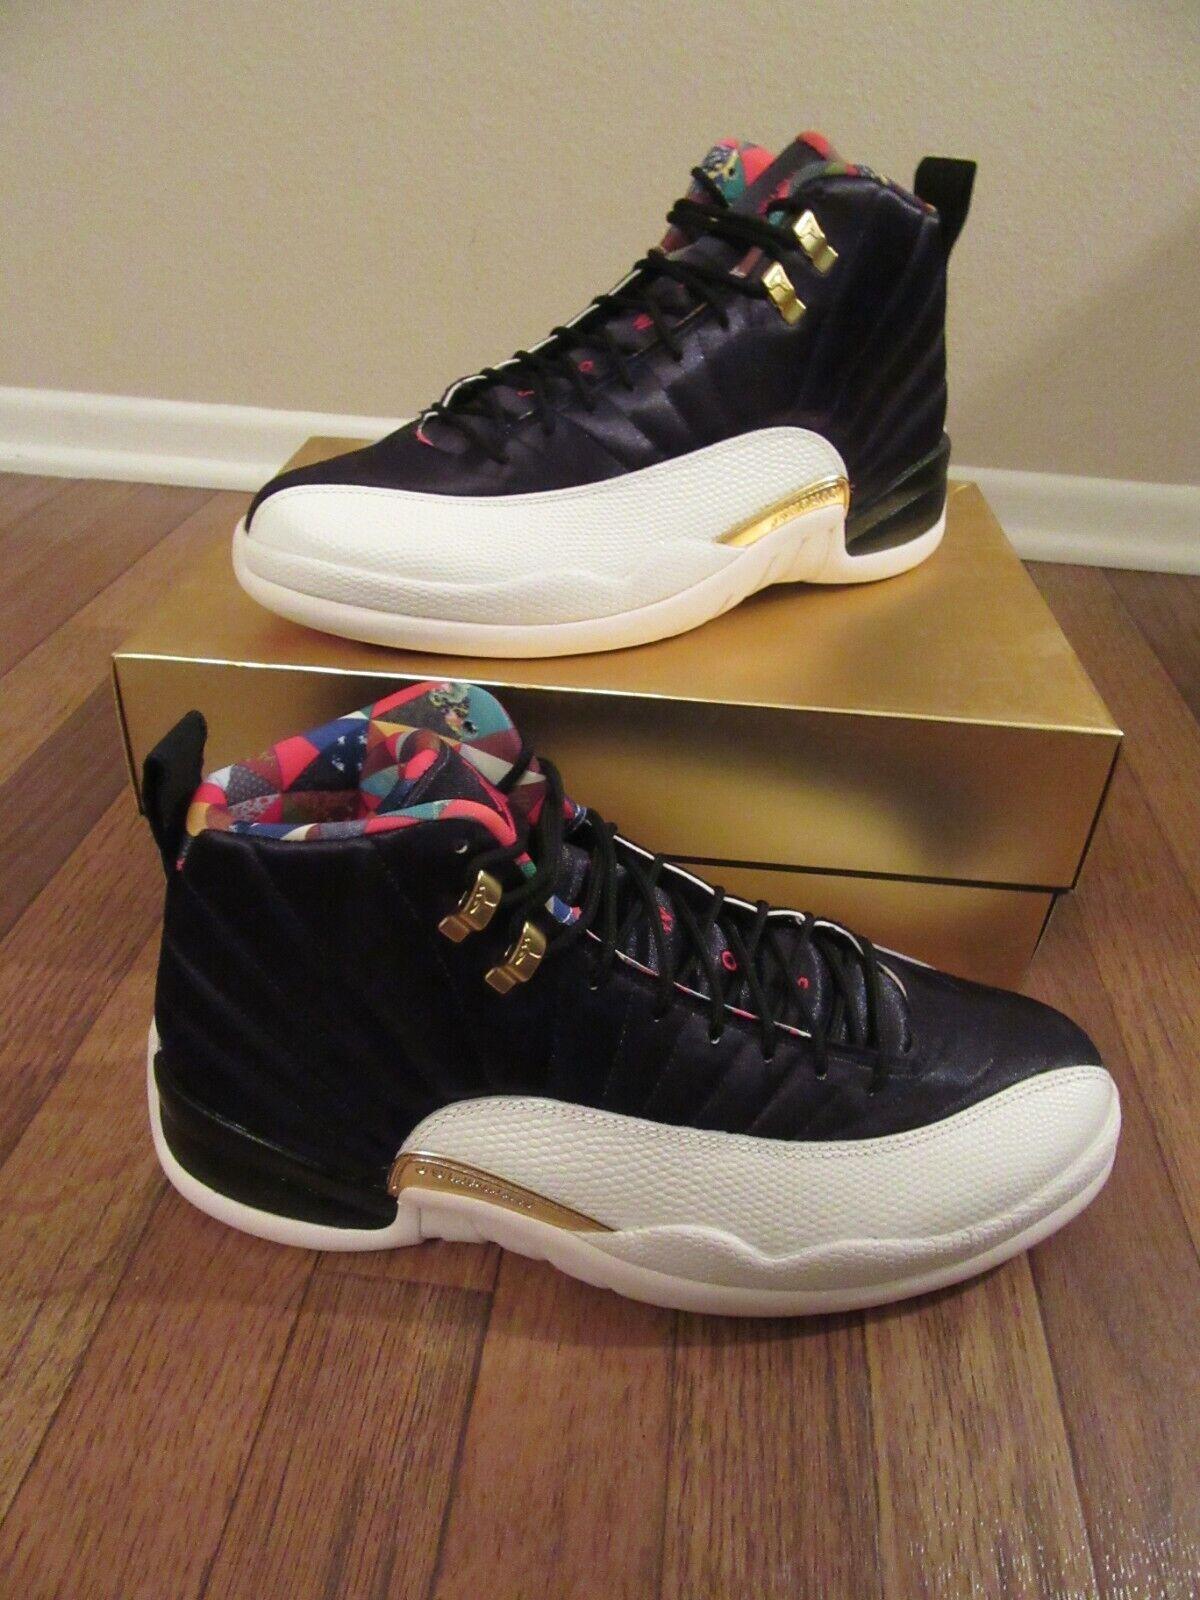 8a1eb864bb0 Nike Air Jordan 12 Retro CNY Size 12 Black True Red Sail Ci2977 006 ...